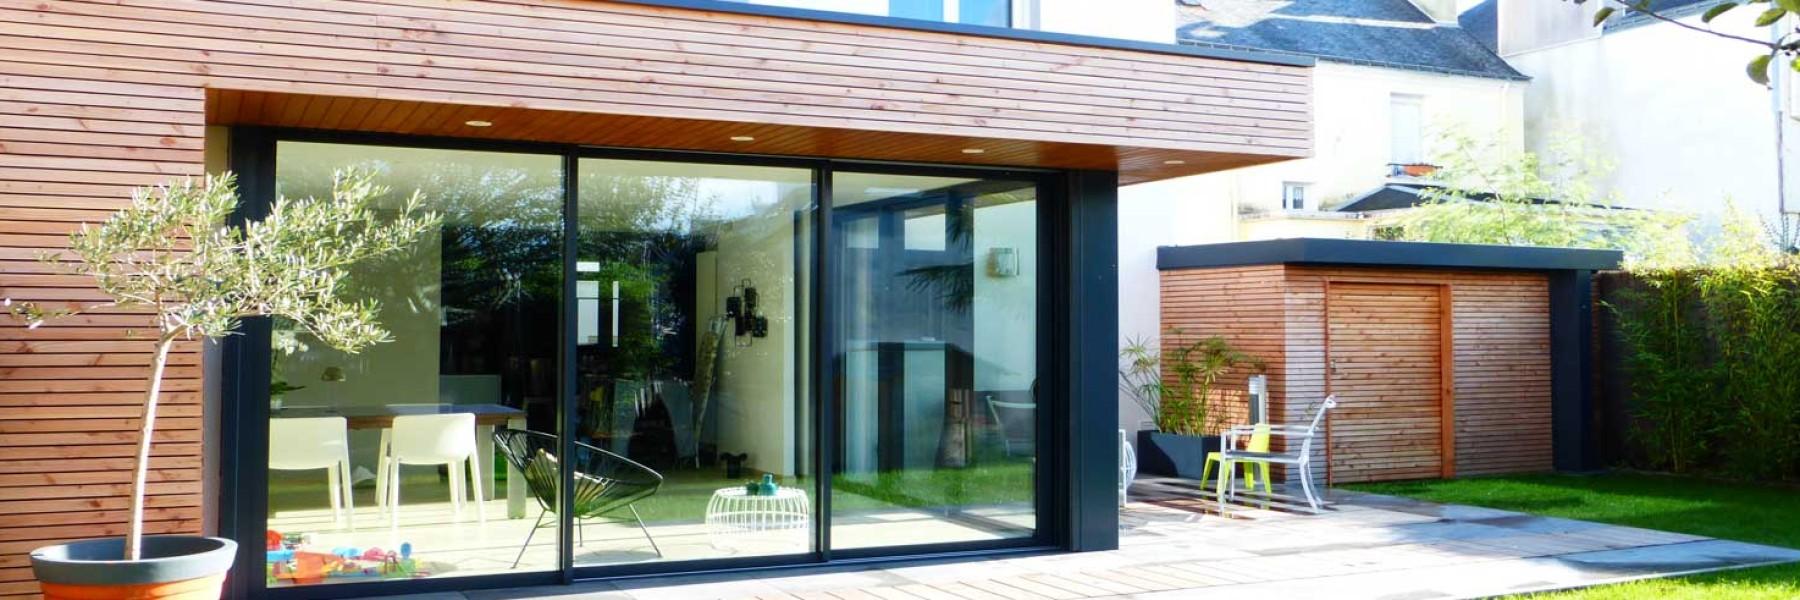 Agrandissement Maison Néo Bretonne rénovation néo bretonne | vmb habitat